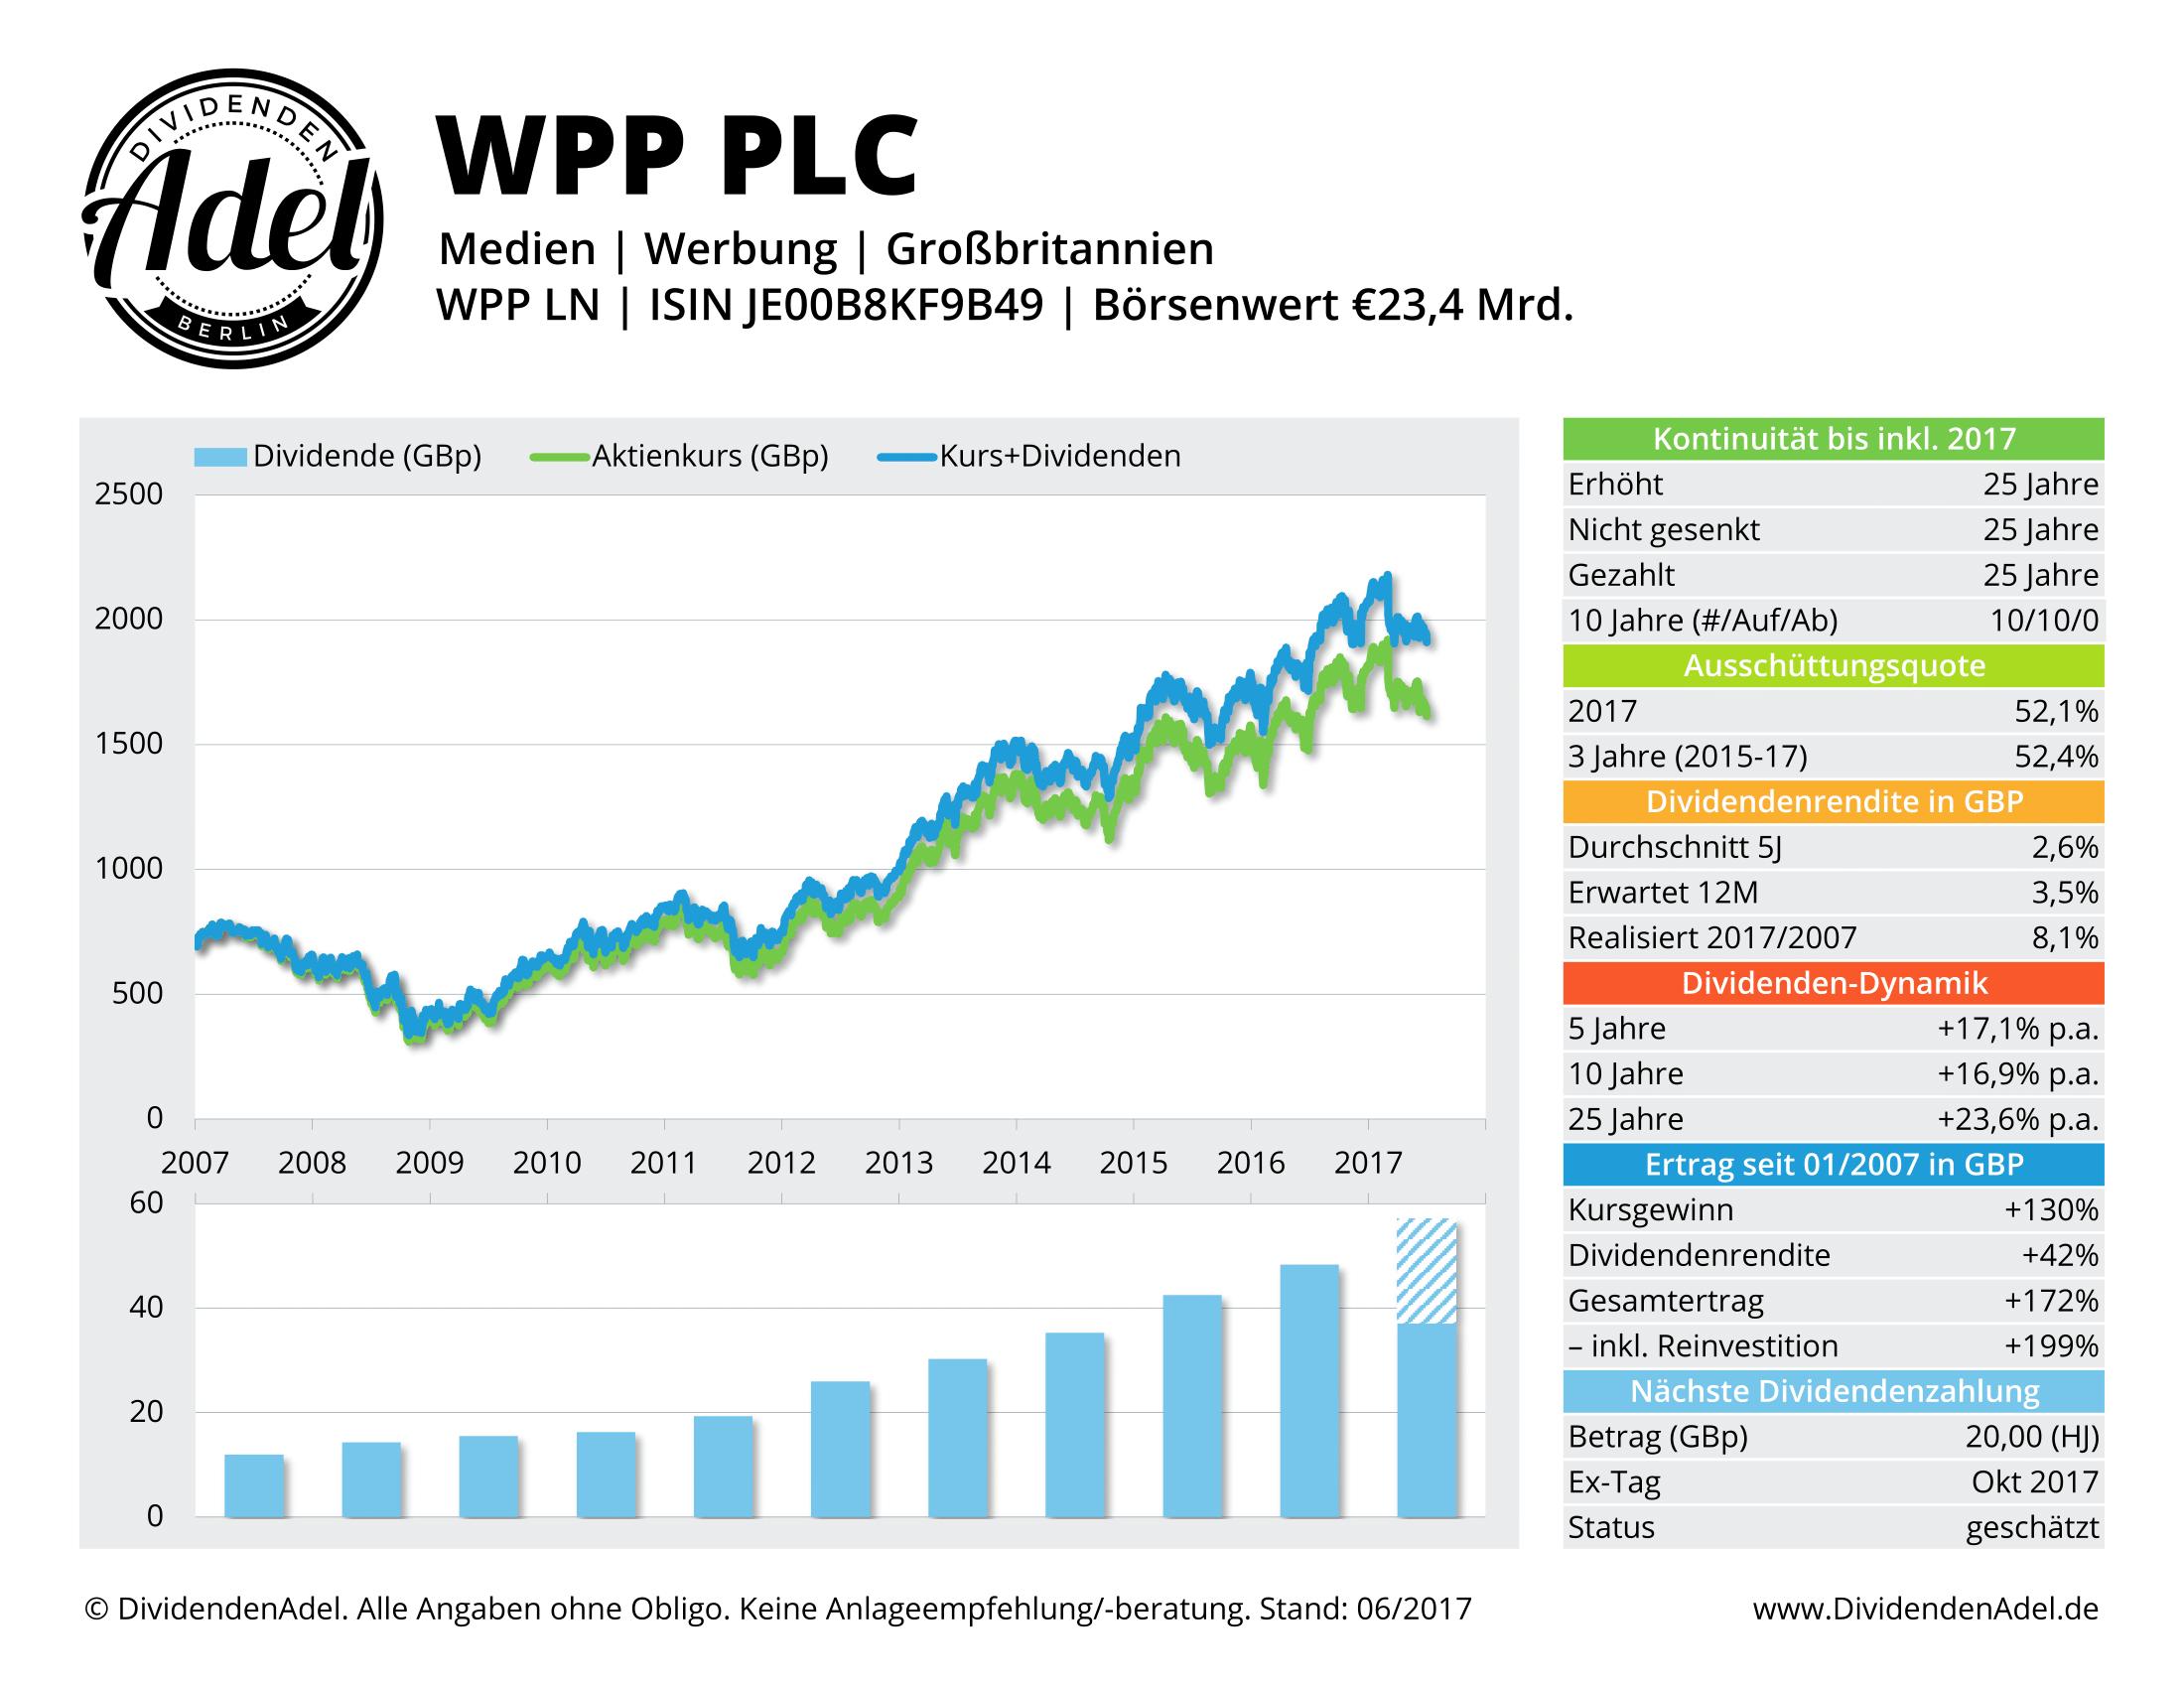 WPP PLC DividendenAdel-Profil